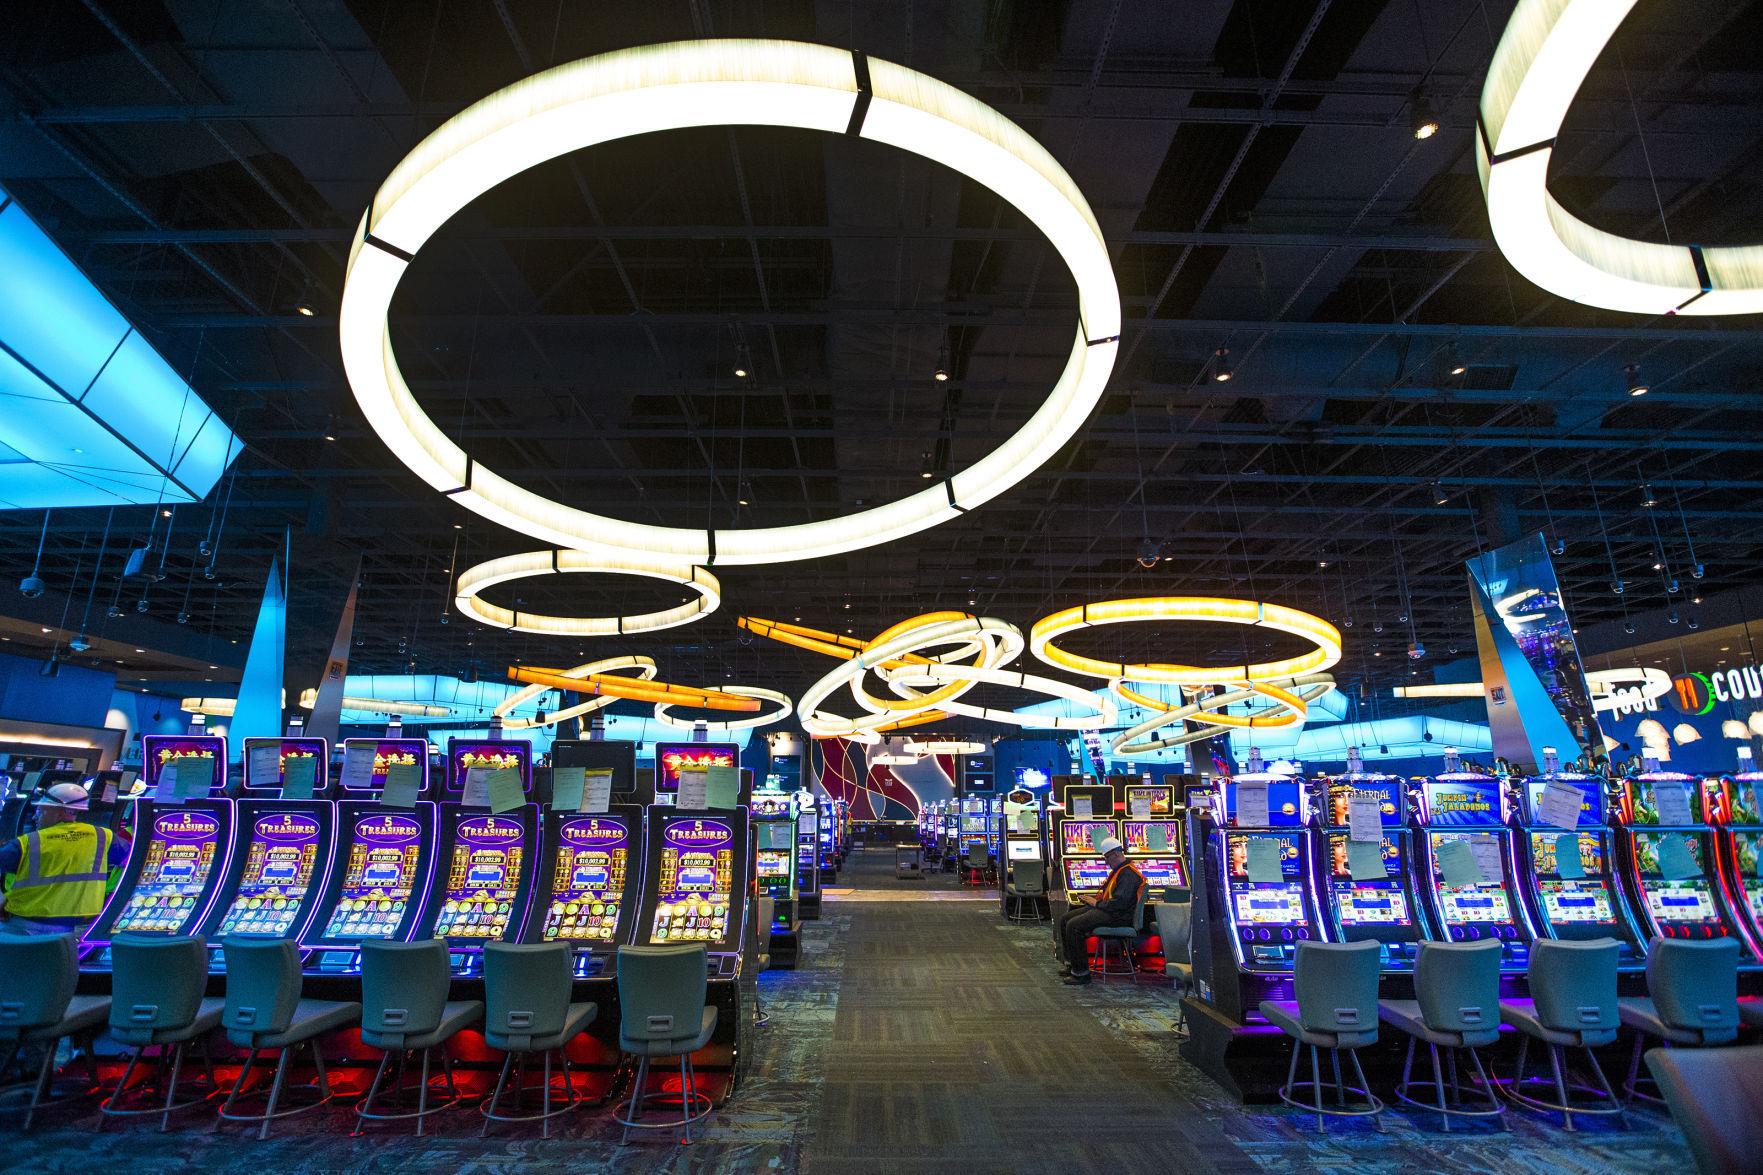 Tohono o odham nation casinos venetian casino sports bar